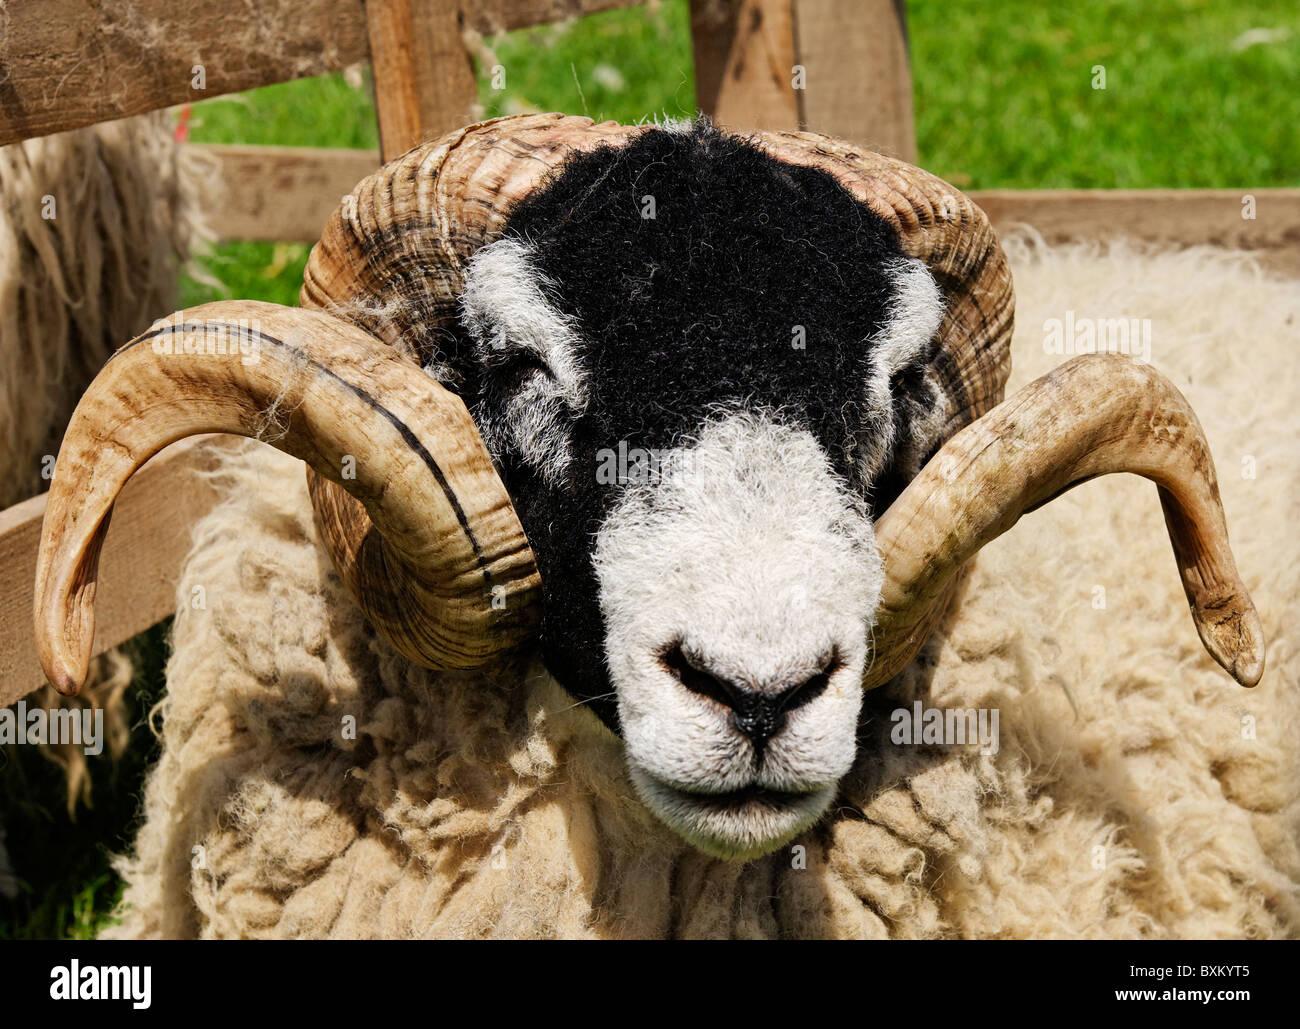 Ram - Stock Image